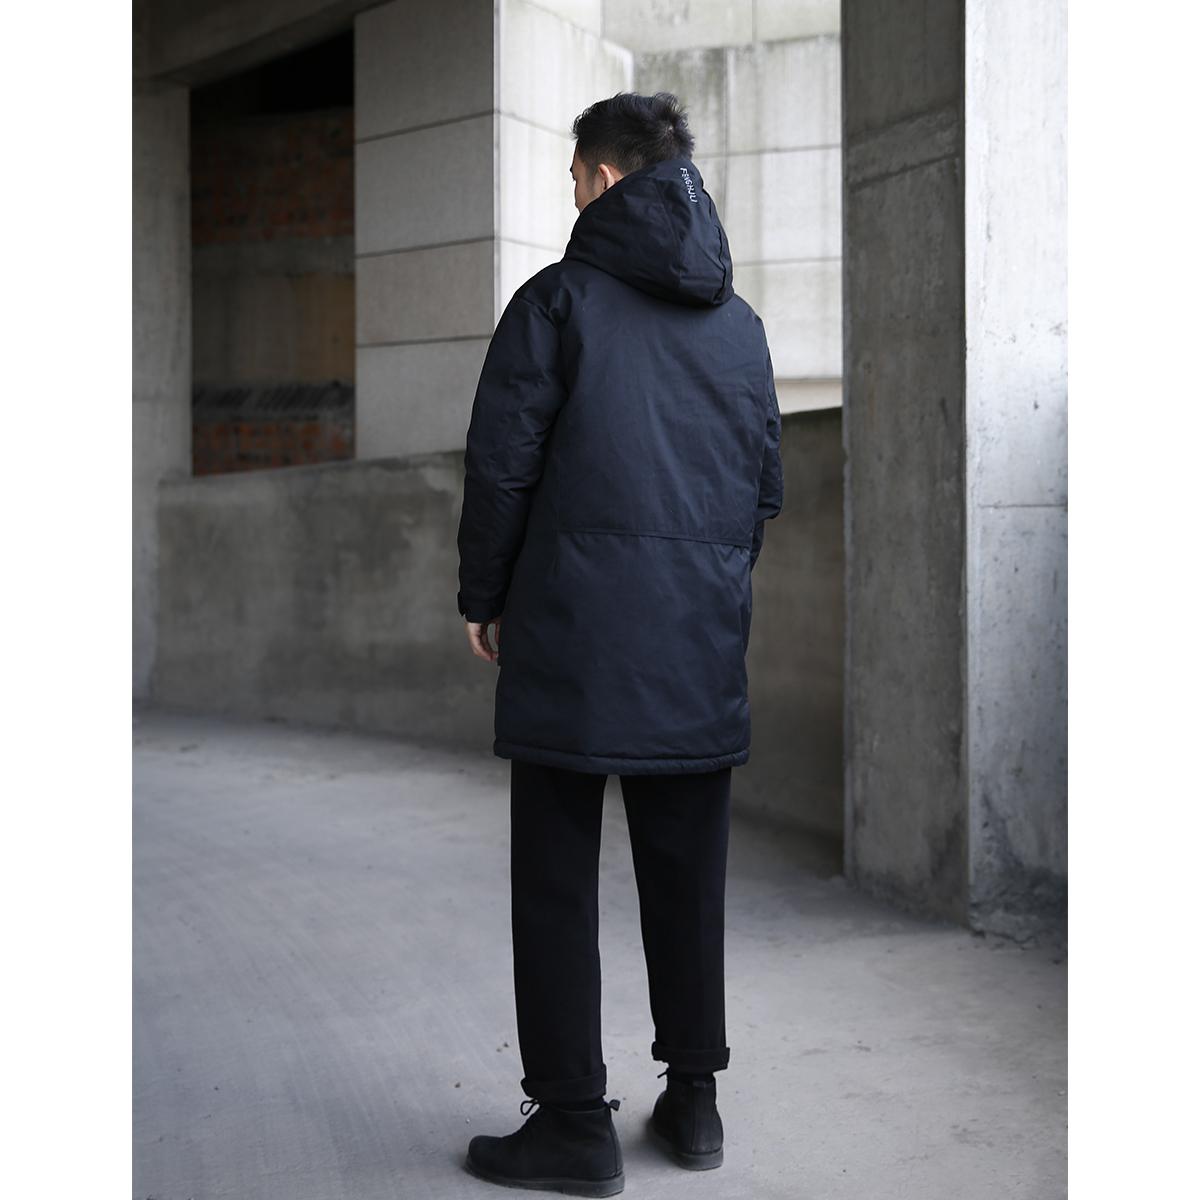 Мужские теплые куртки / Пуховики Артикул 608136488678